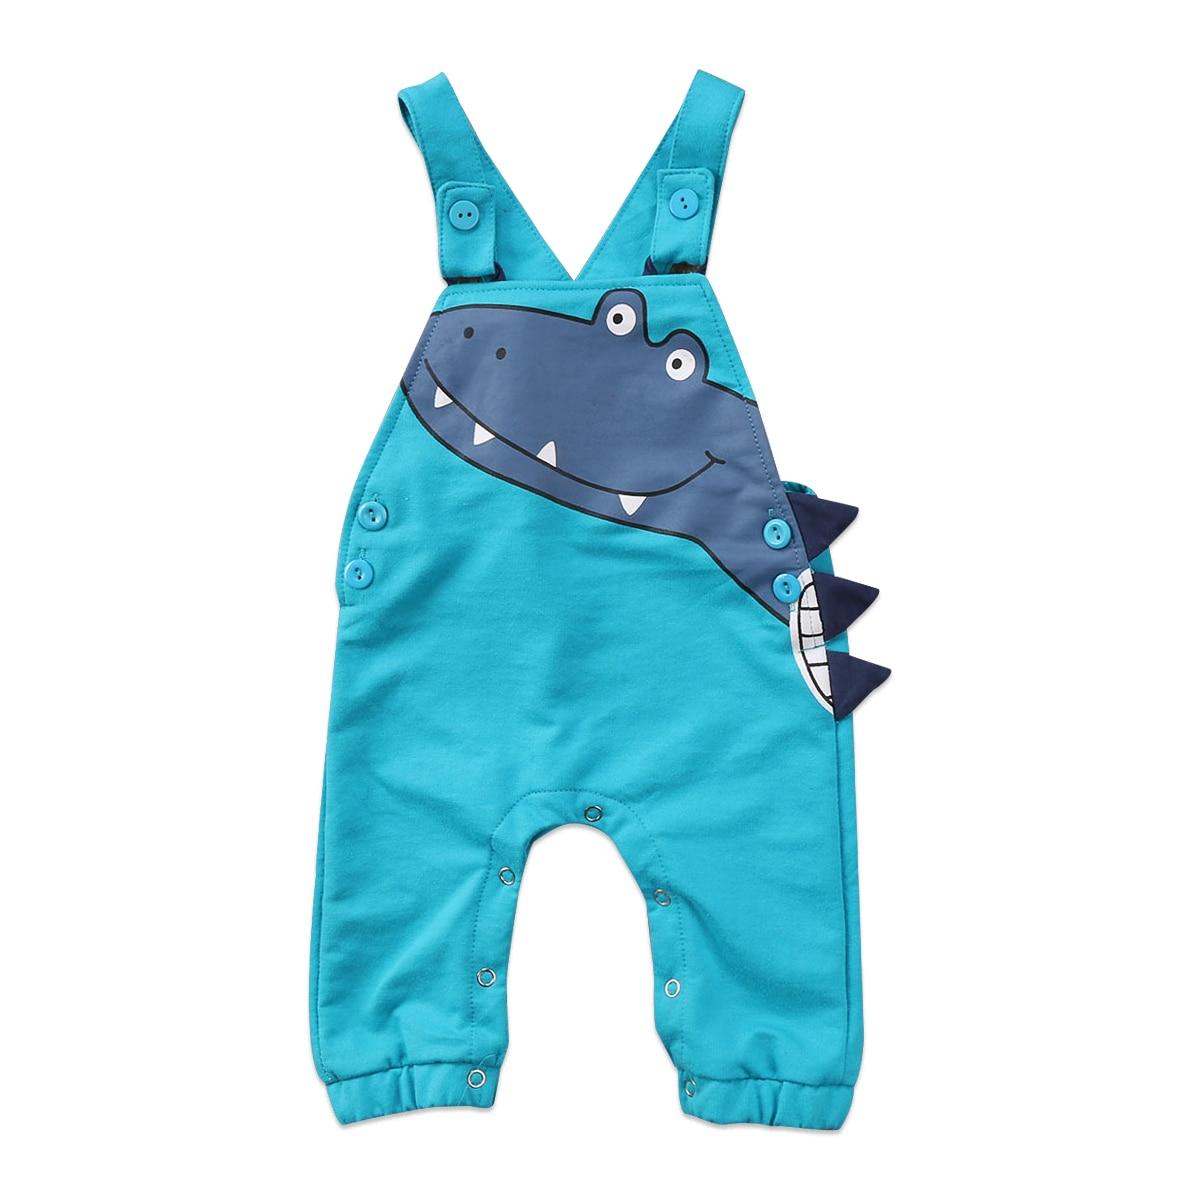 2017 Blue Newborn Infant Baby Boy Girl Dinosaur Sleeveless ...